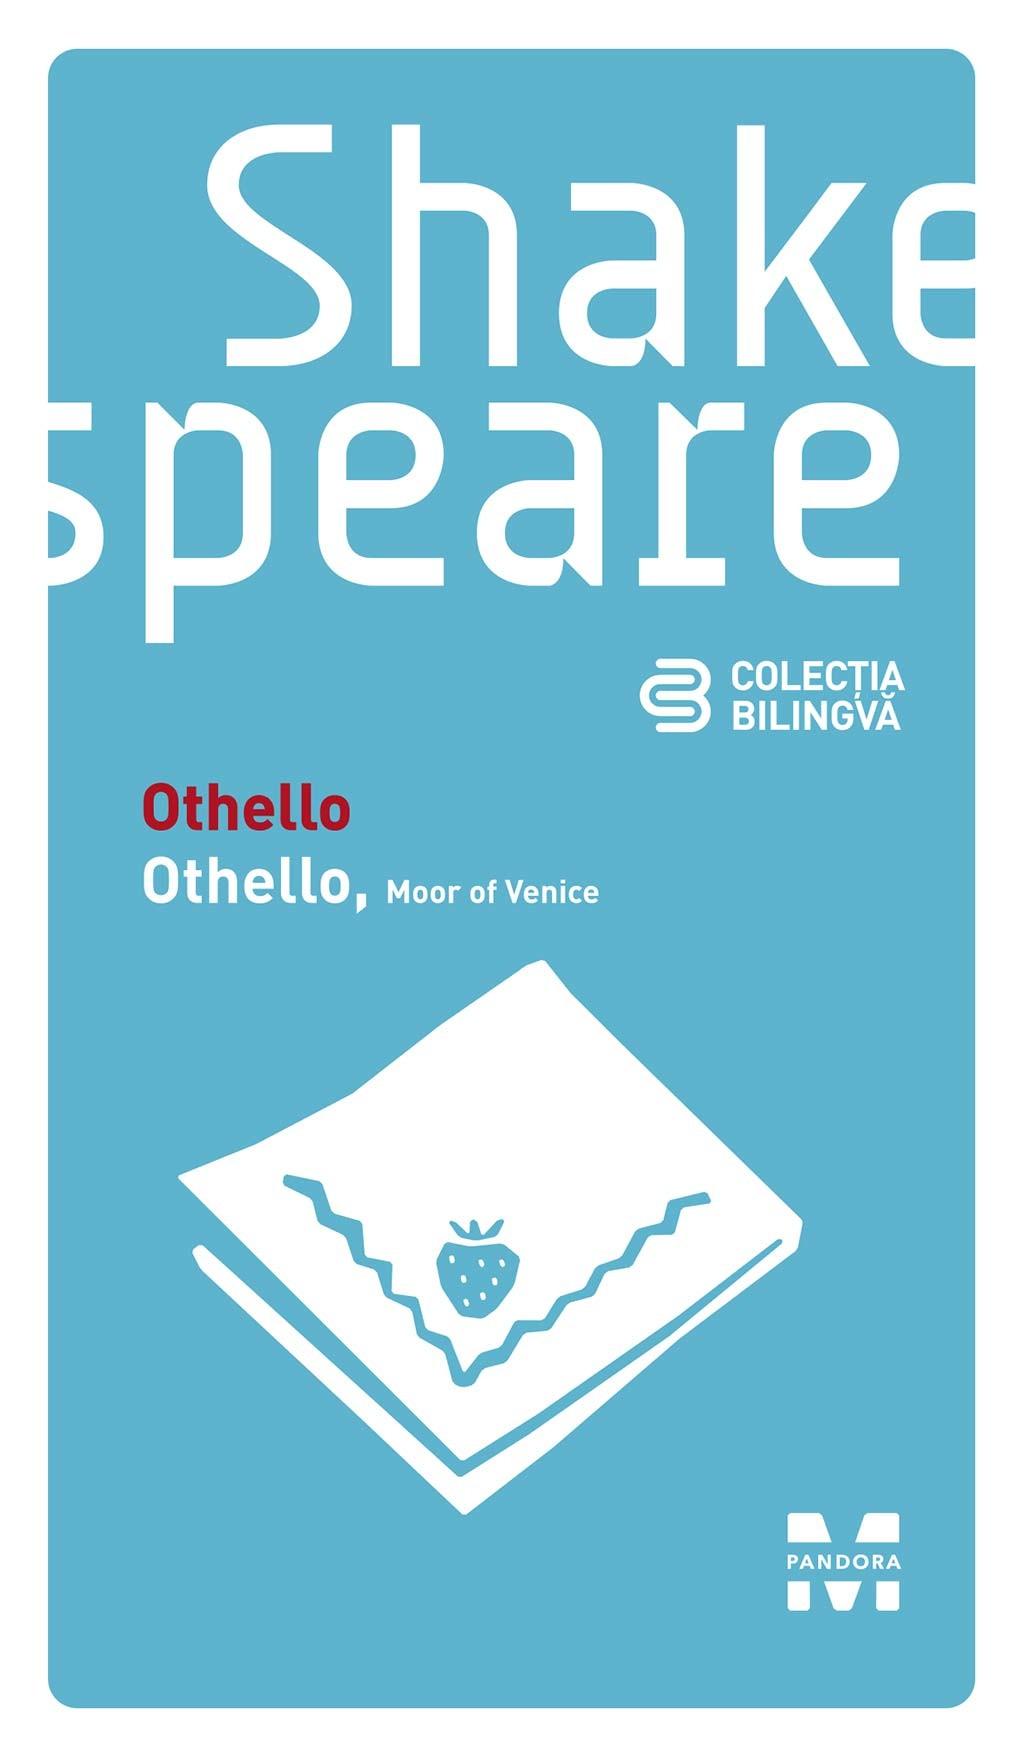 othello moor of venice pdf download - photo#11